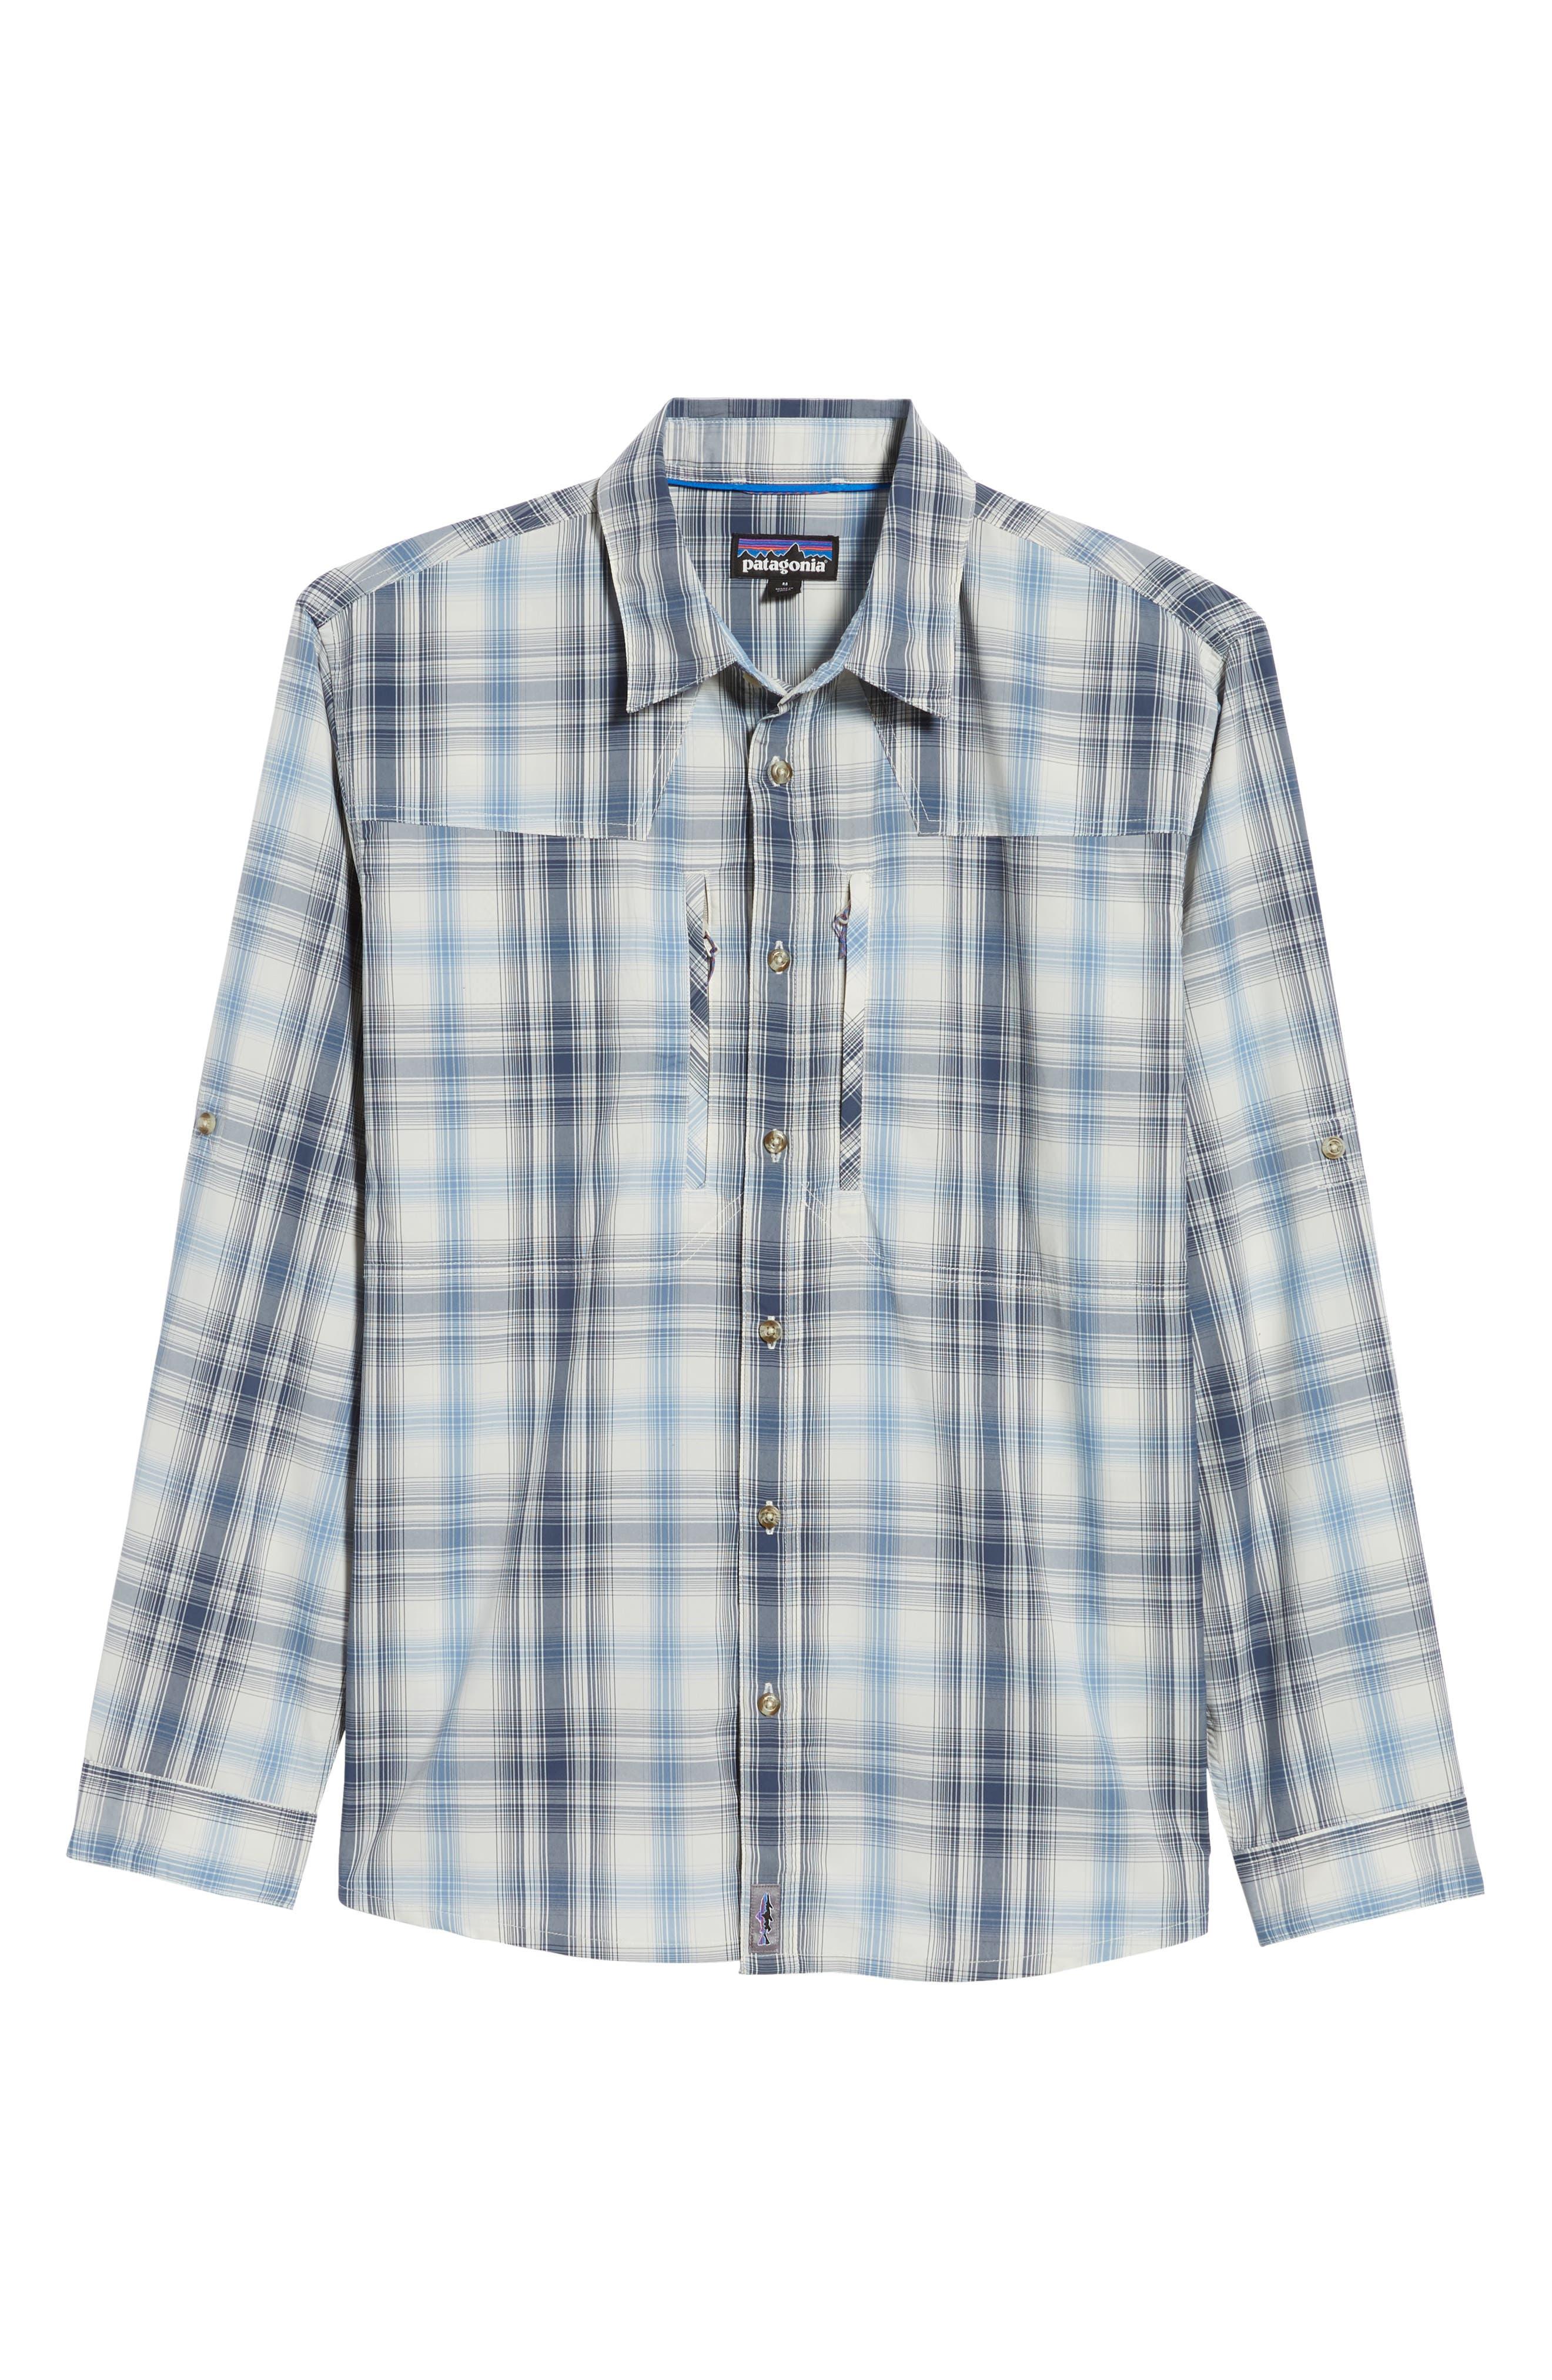 Regular Fit Plaid Sport Shirt,                             Alternate thumbnail 6, color,                             405